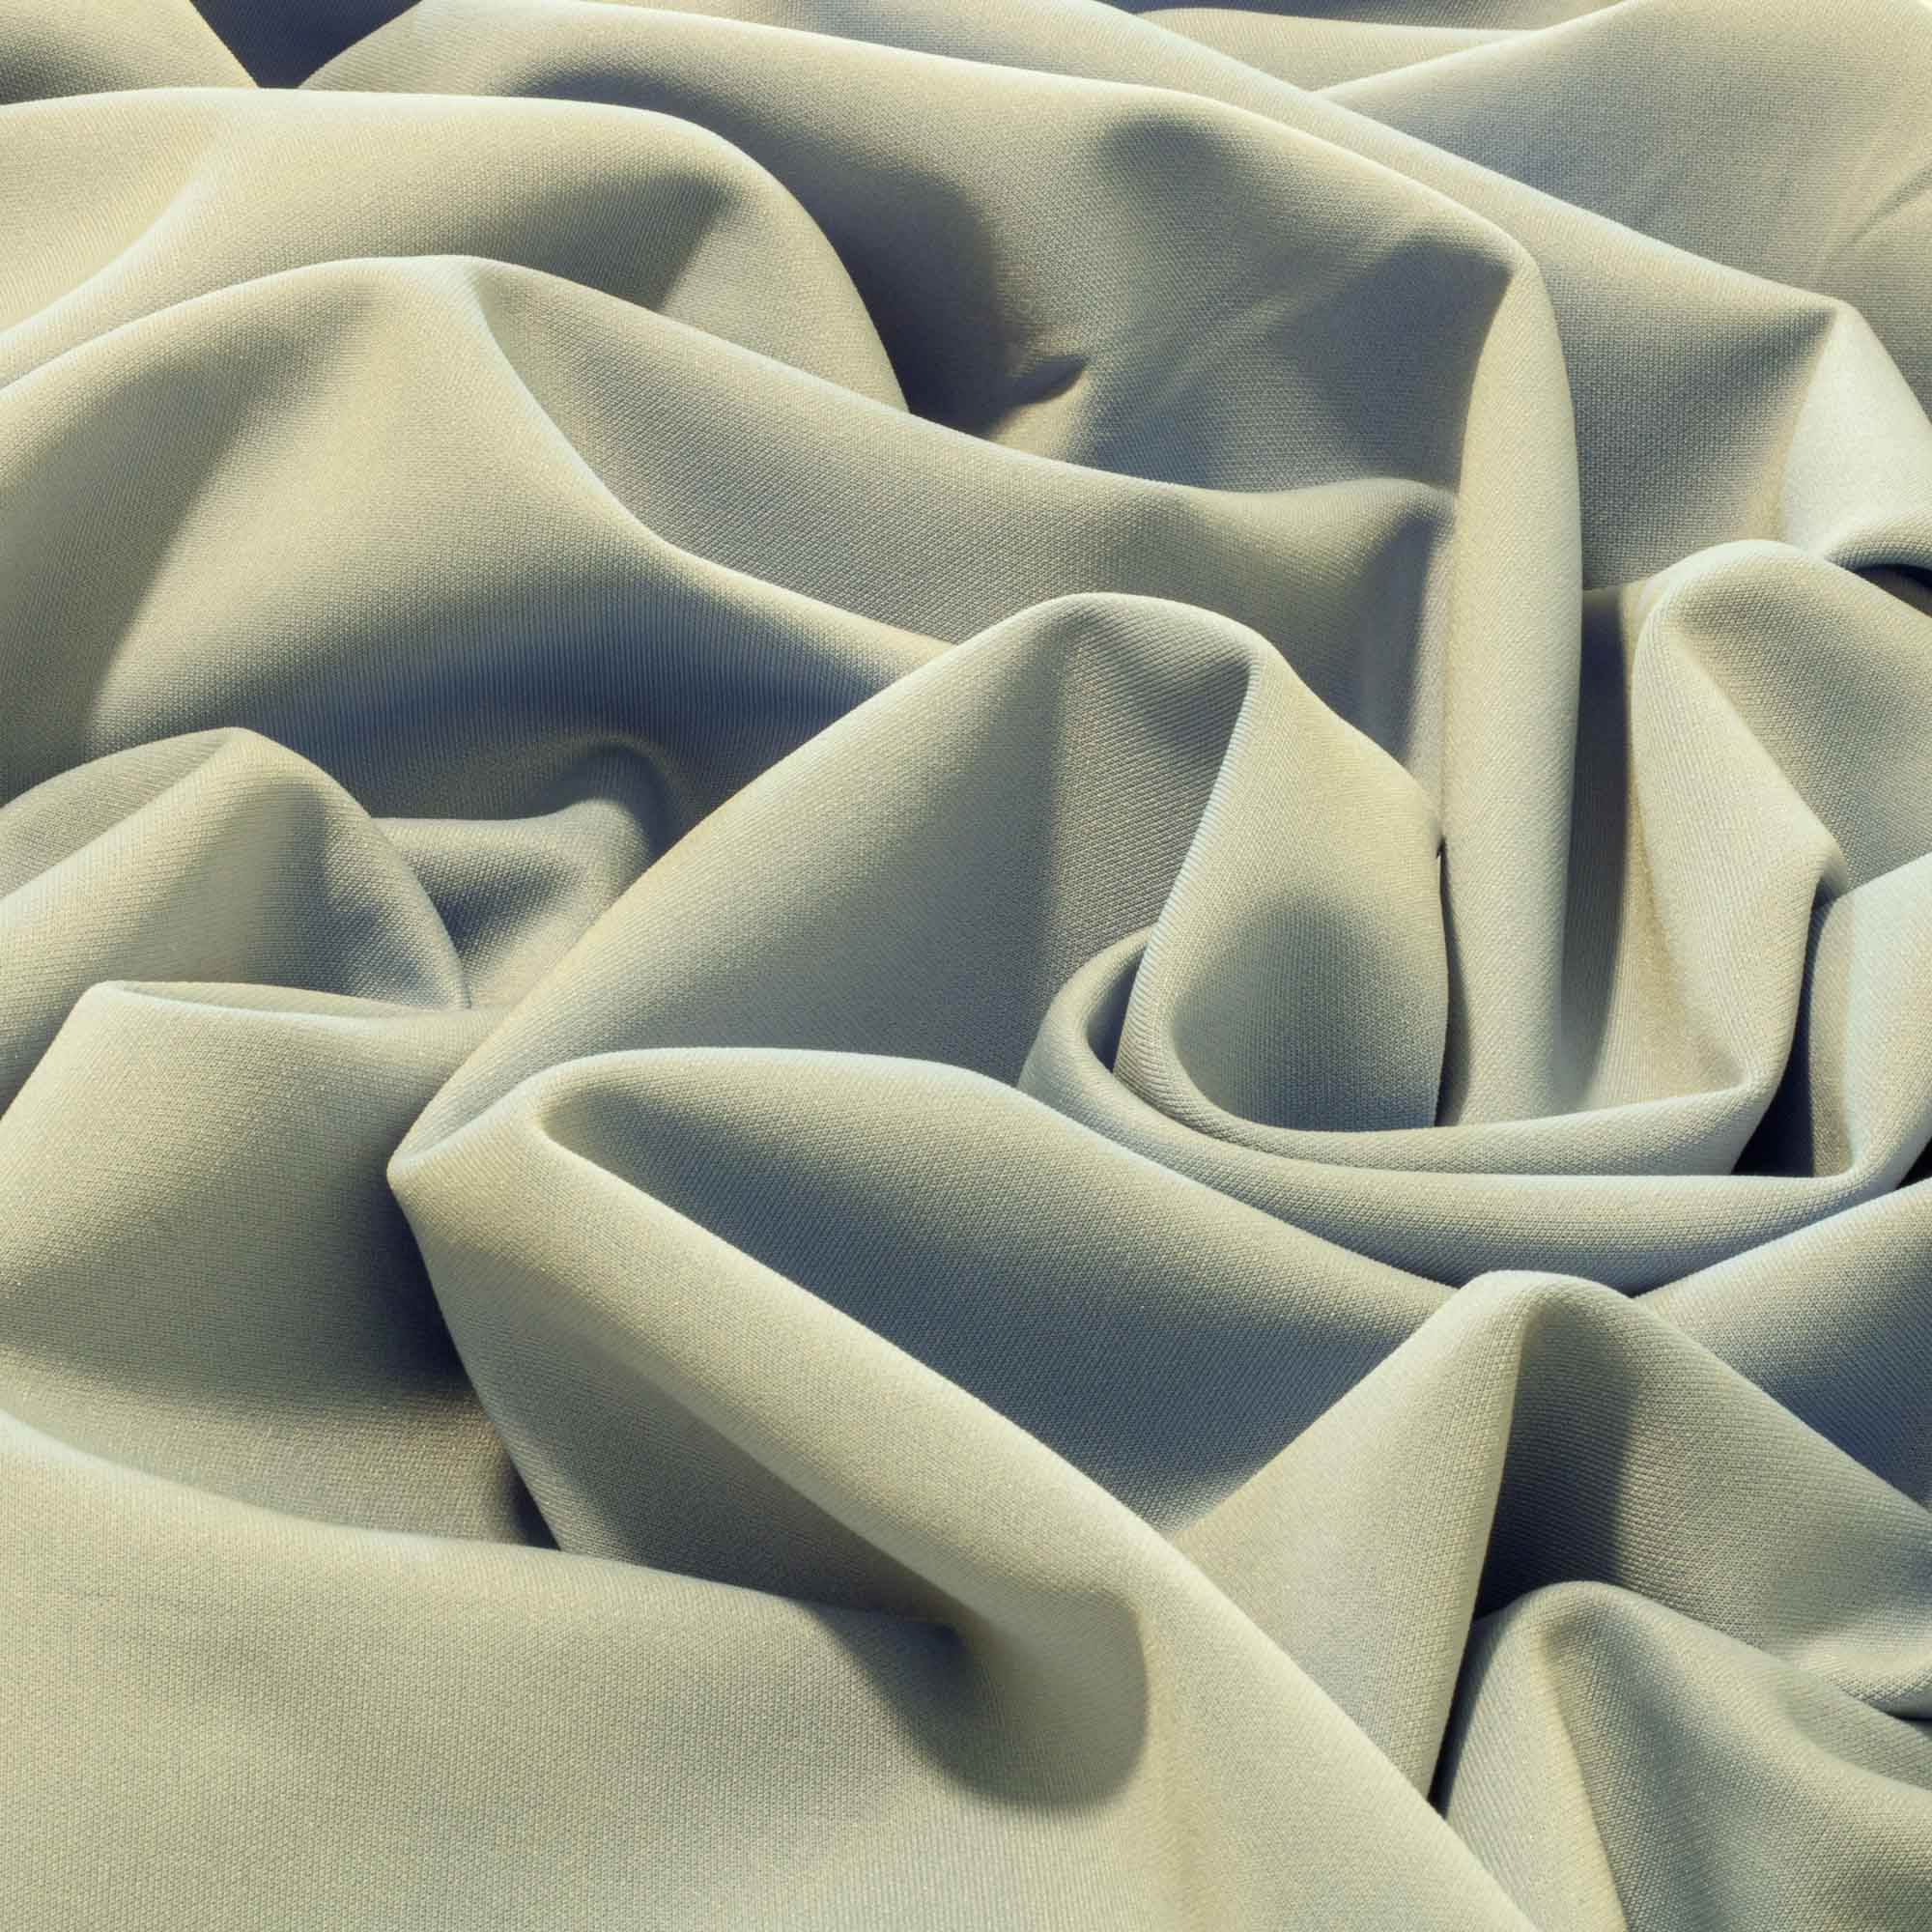 Tecido Malha Neoprene 95% Poliester 5% Elastano Azul Claro